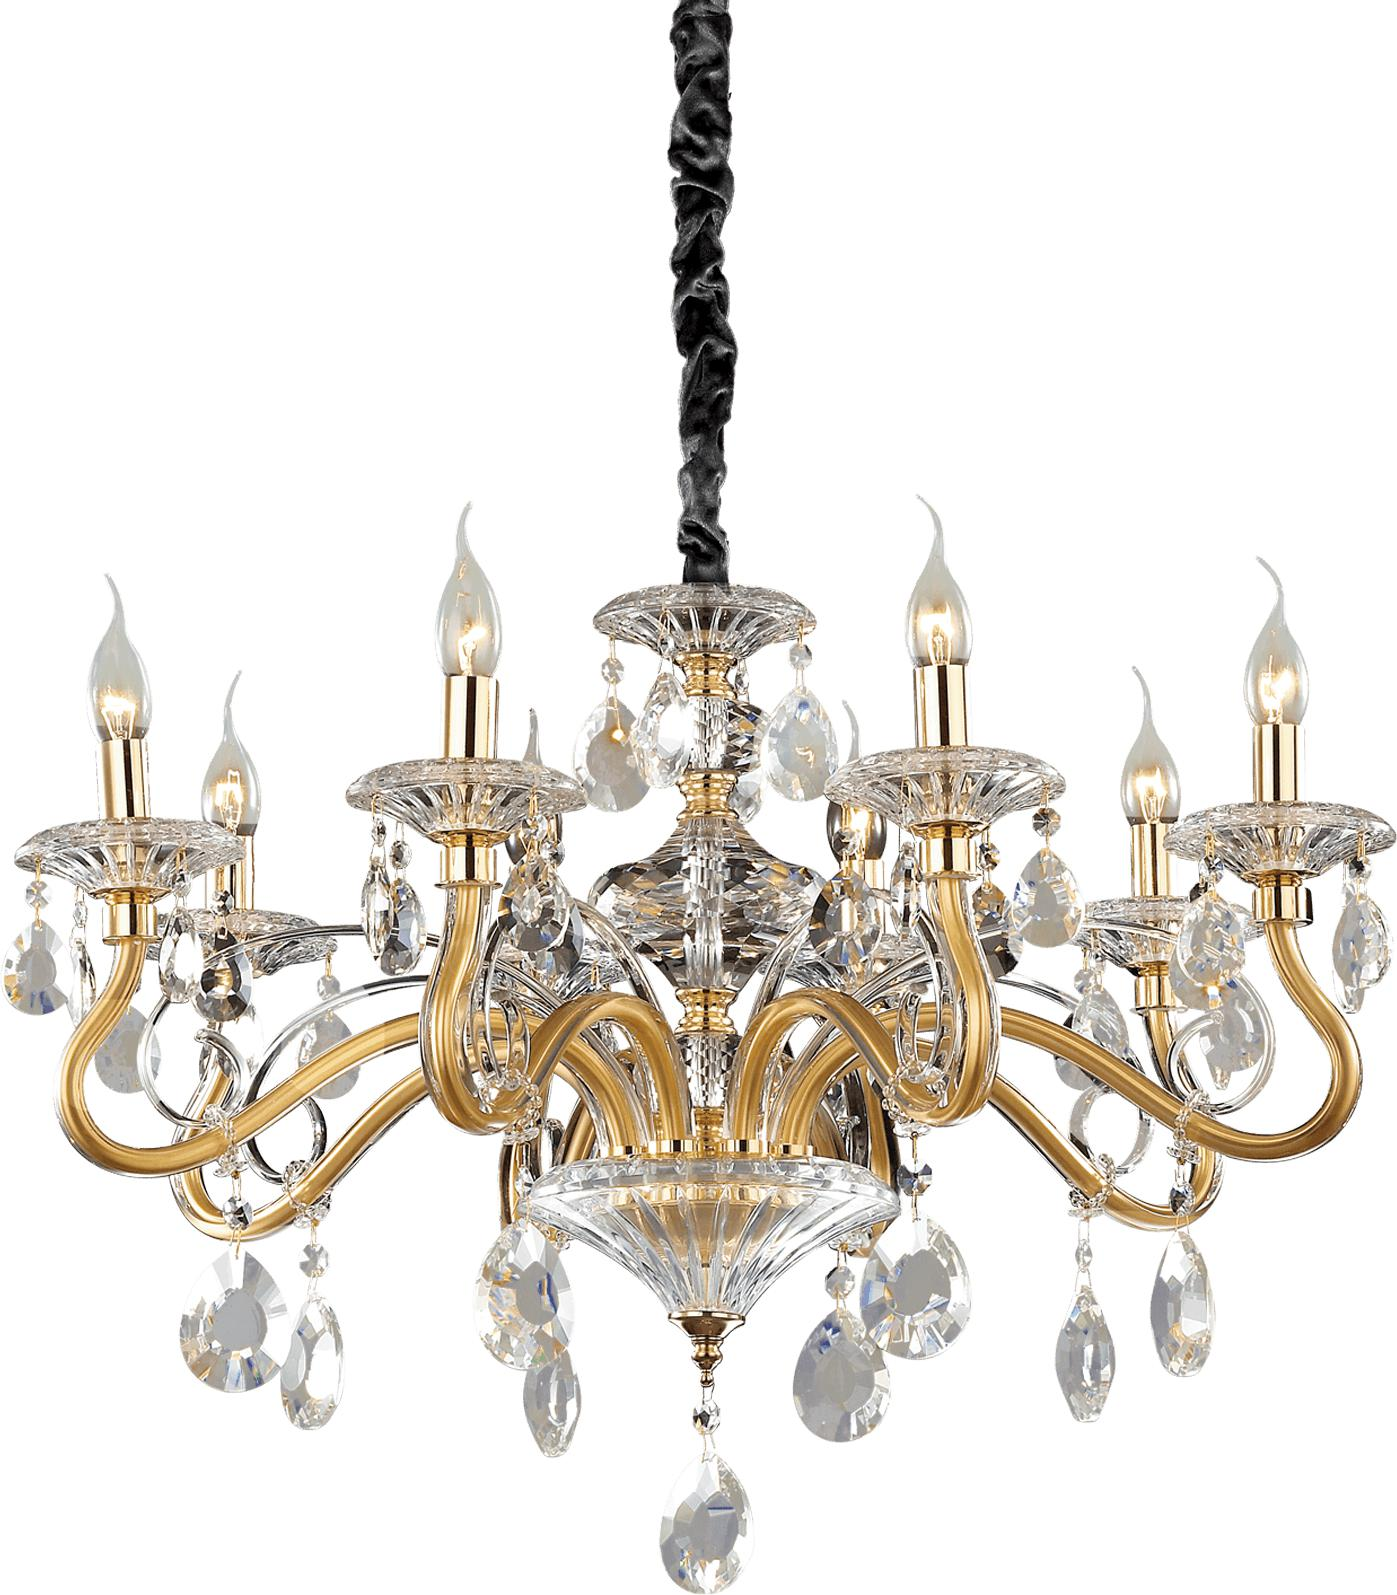 Ideal lux LED Negresco Kronleuchter 8x5W 87764